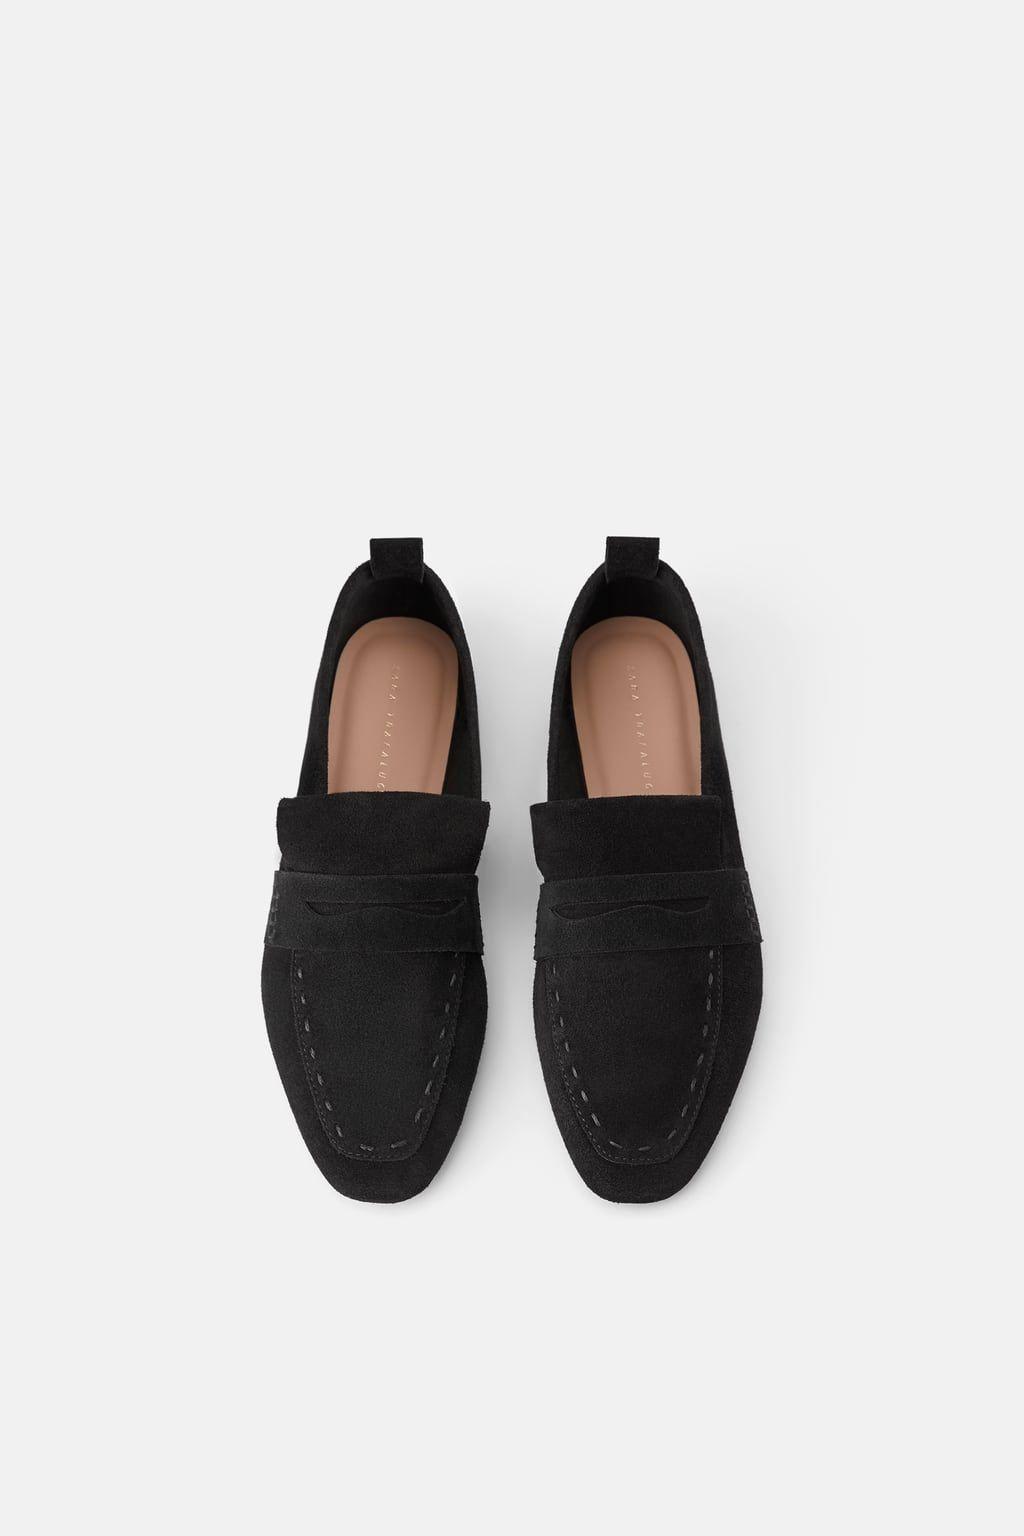 e9114559da SPLIT SUEDE LOAFERS DETAILS3,990 RSDBLACK - 3566/001 Leather Loafer Shoes,  Leather